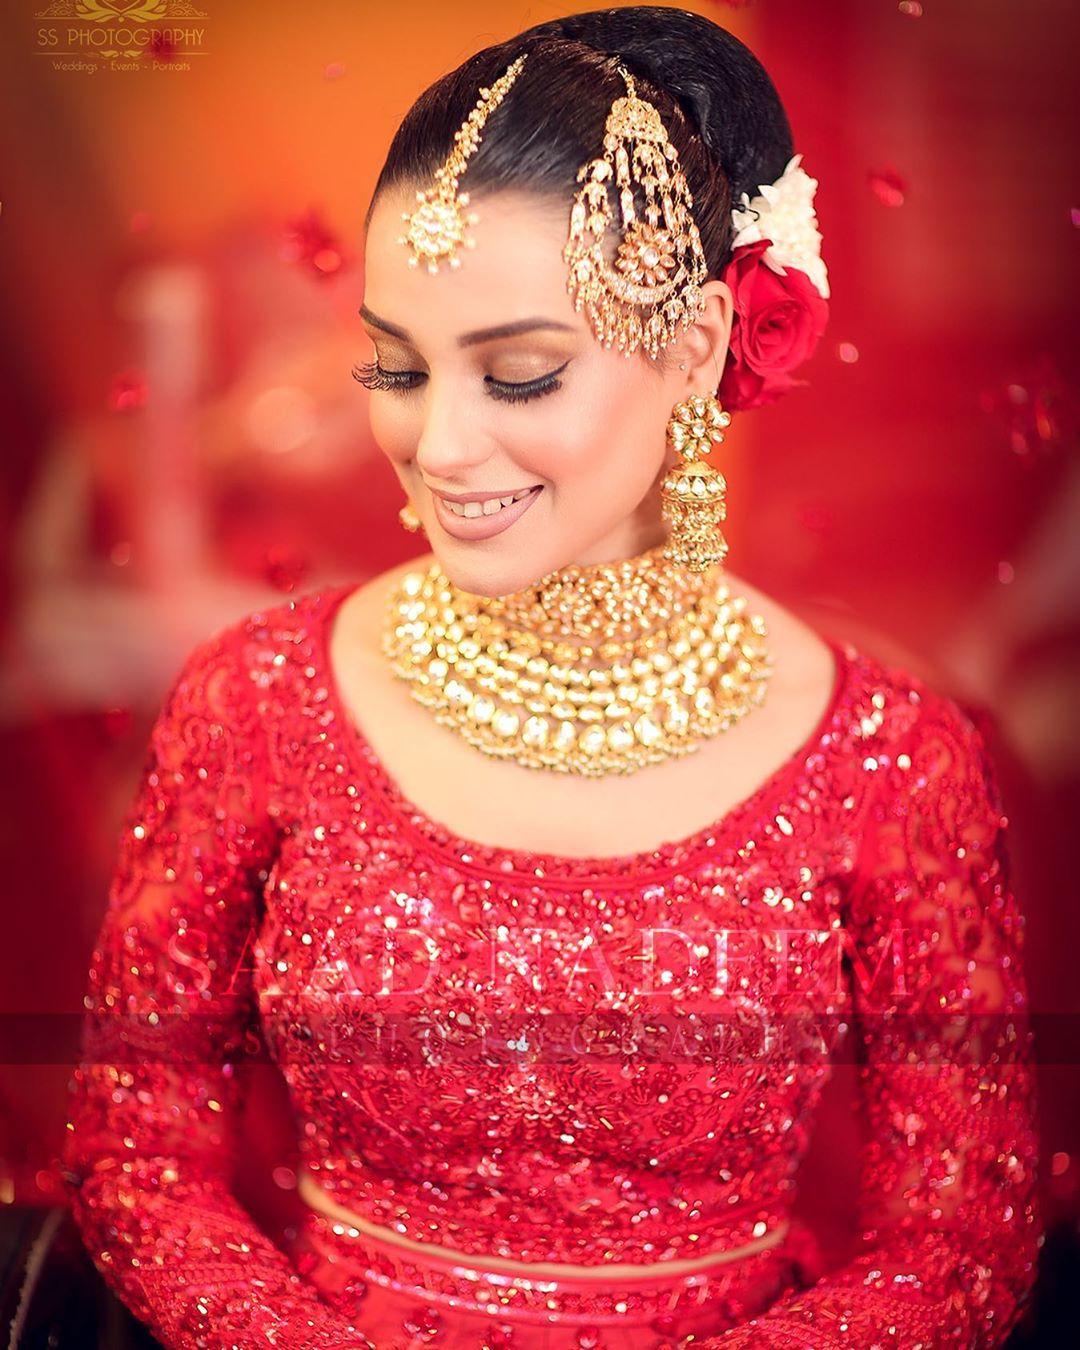 Iqra Aziz and Yasir Hussain Wedding Pictures (7)